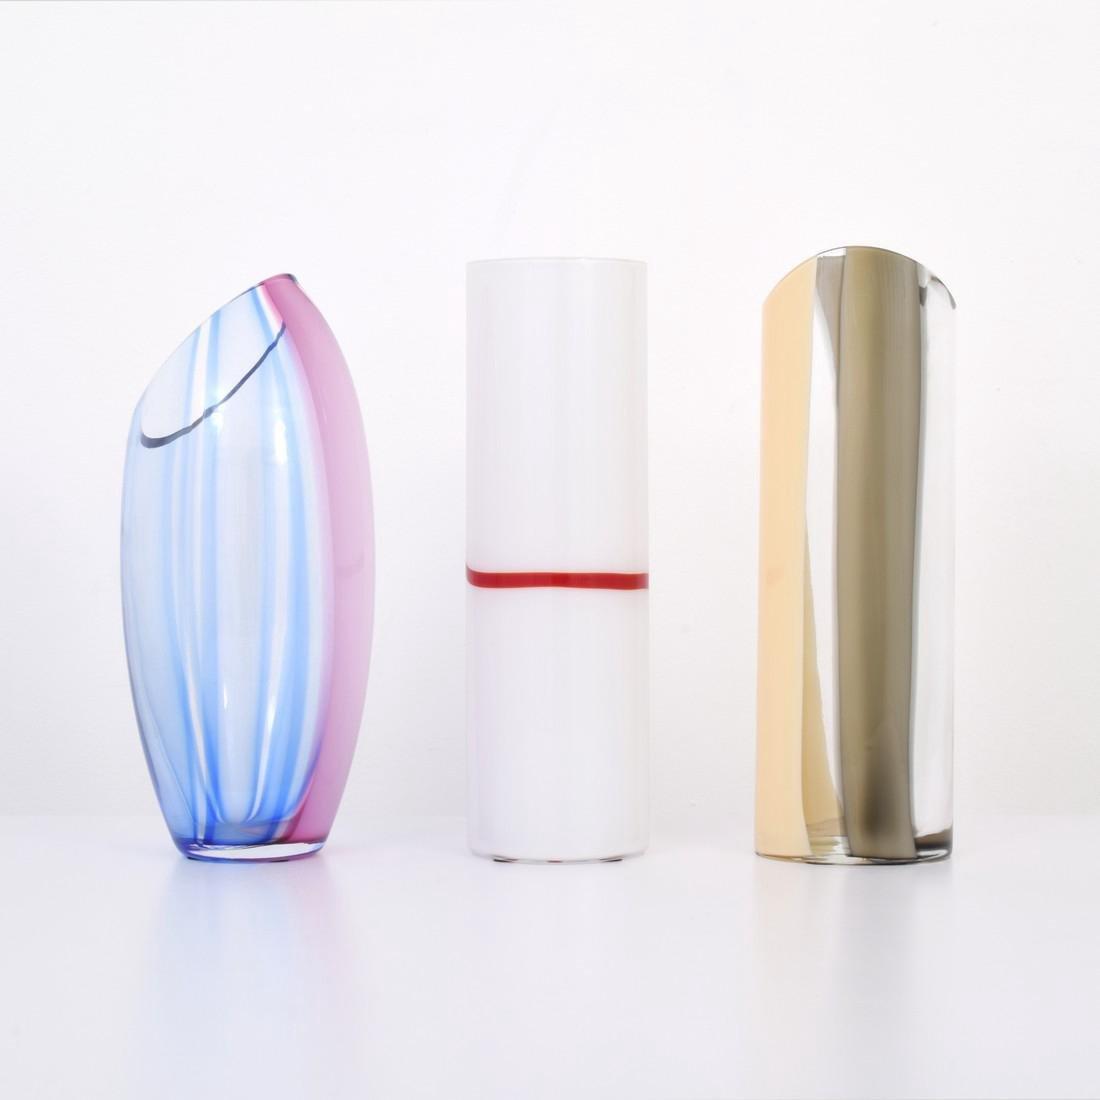 3 Large Livio Seguso Vases, Murano - 8